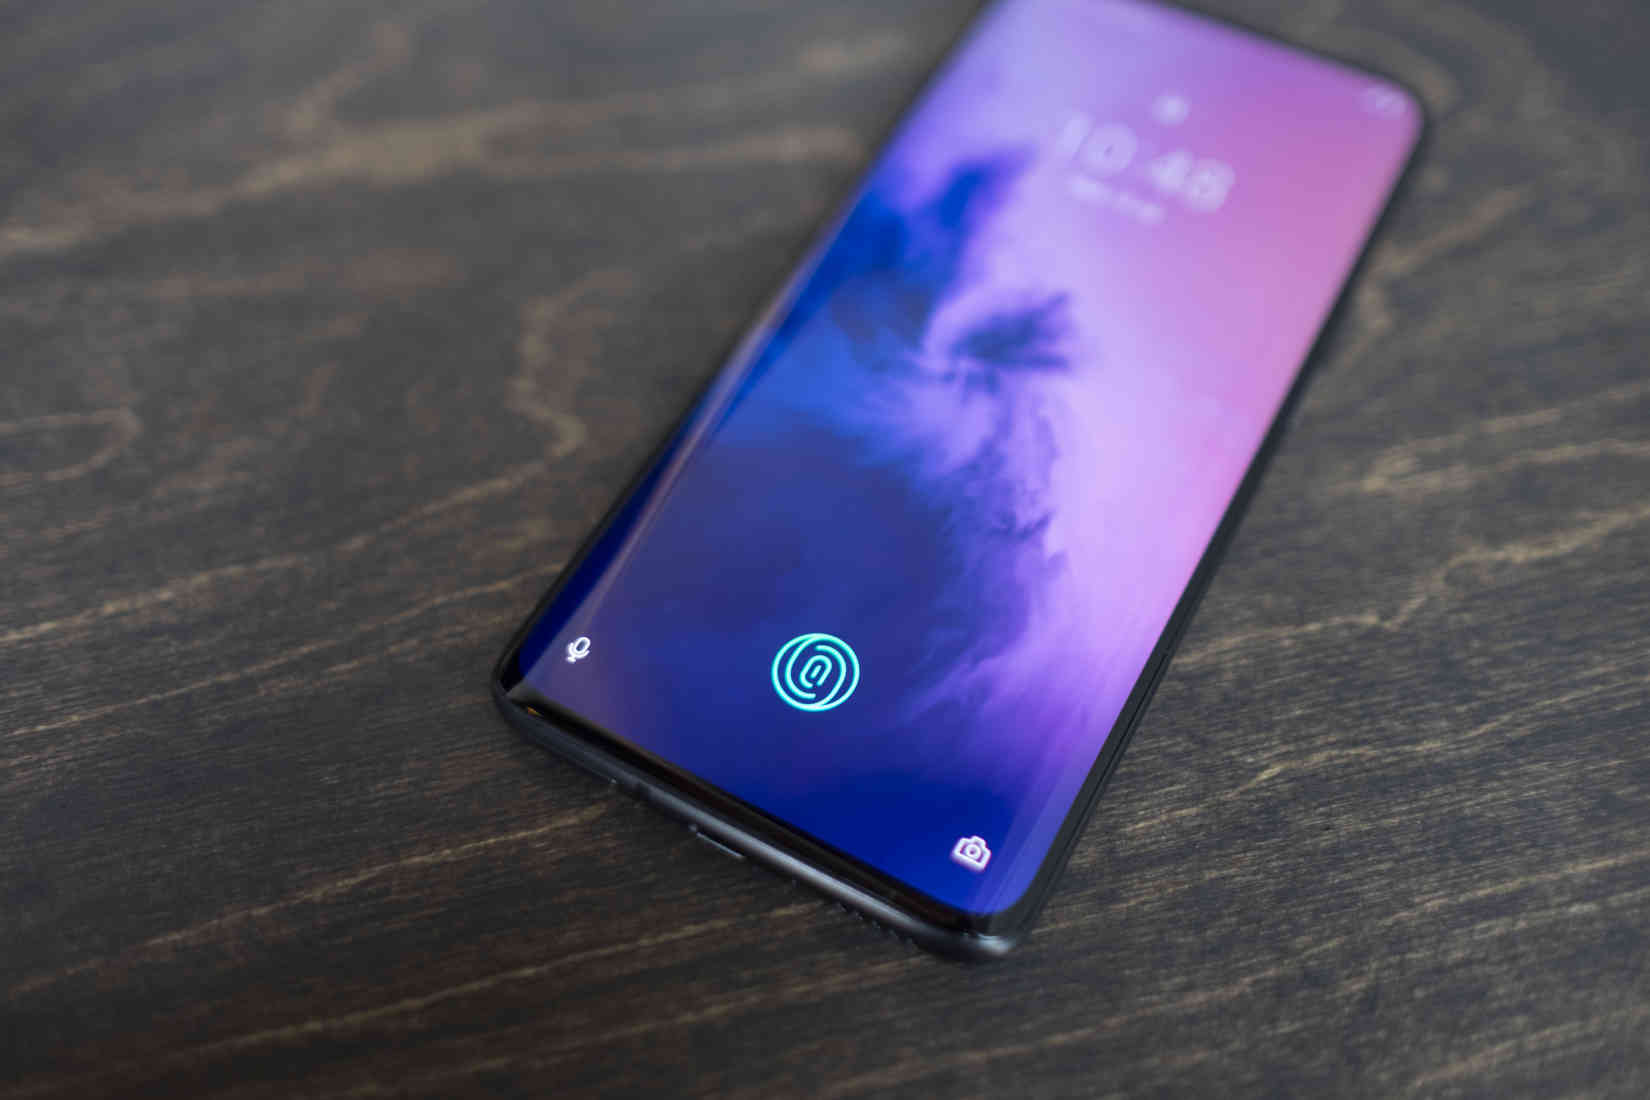 In-display fingerprint sensor on OnePlus 7 Pro